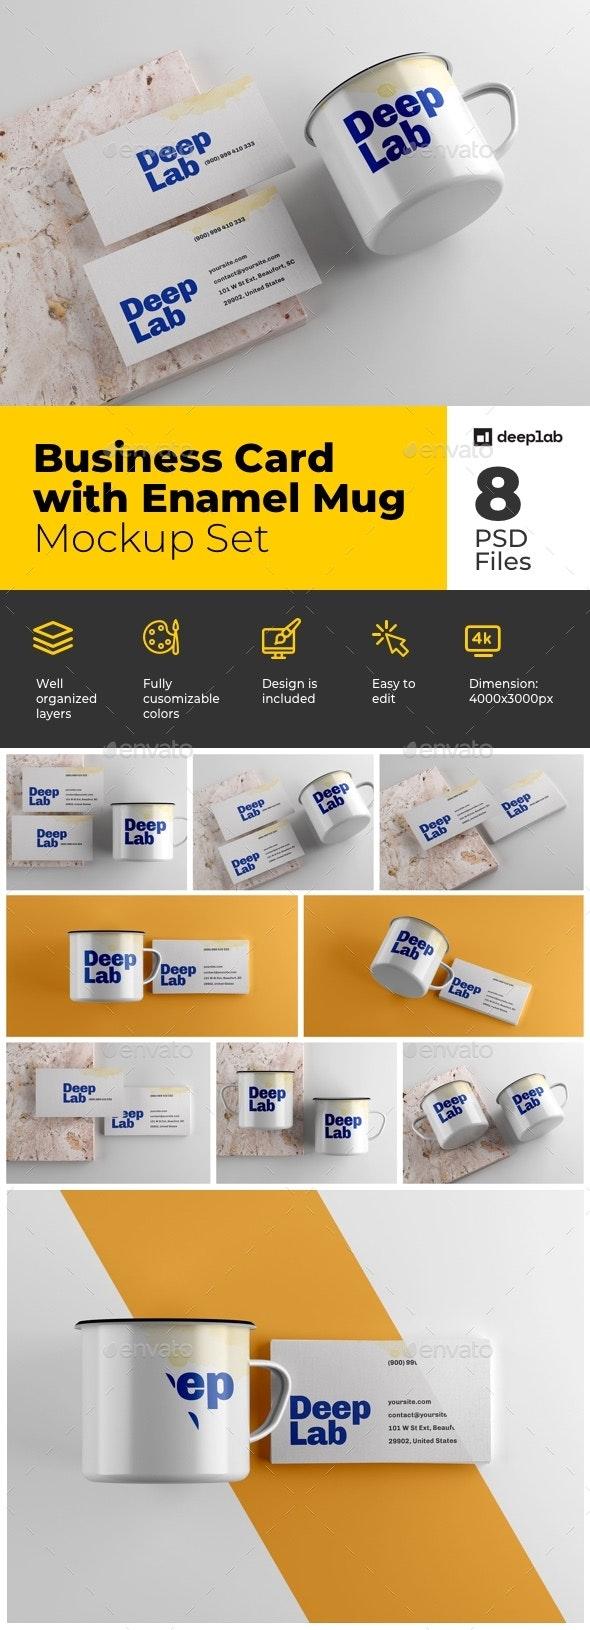 Business Card with Enamel Mug Mockup Set - Product Mock-Ups Graphics